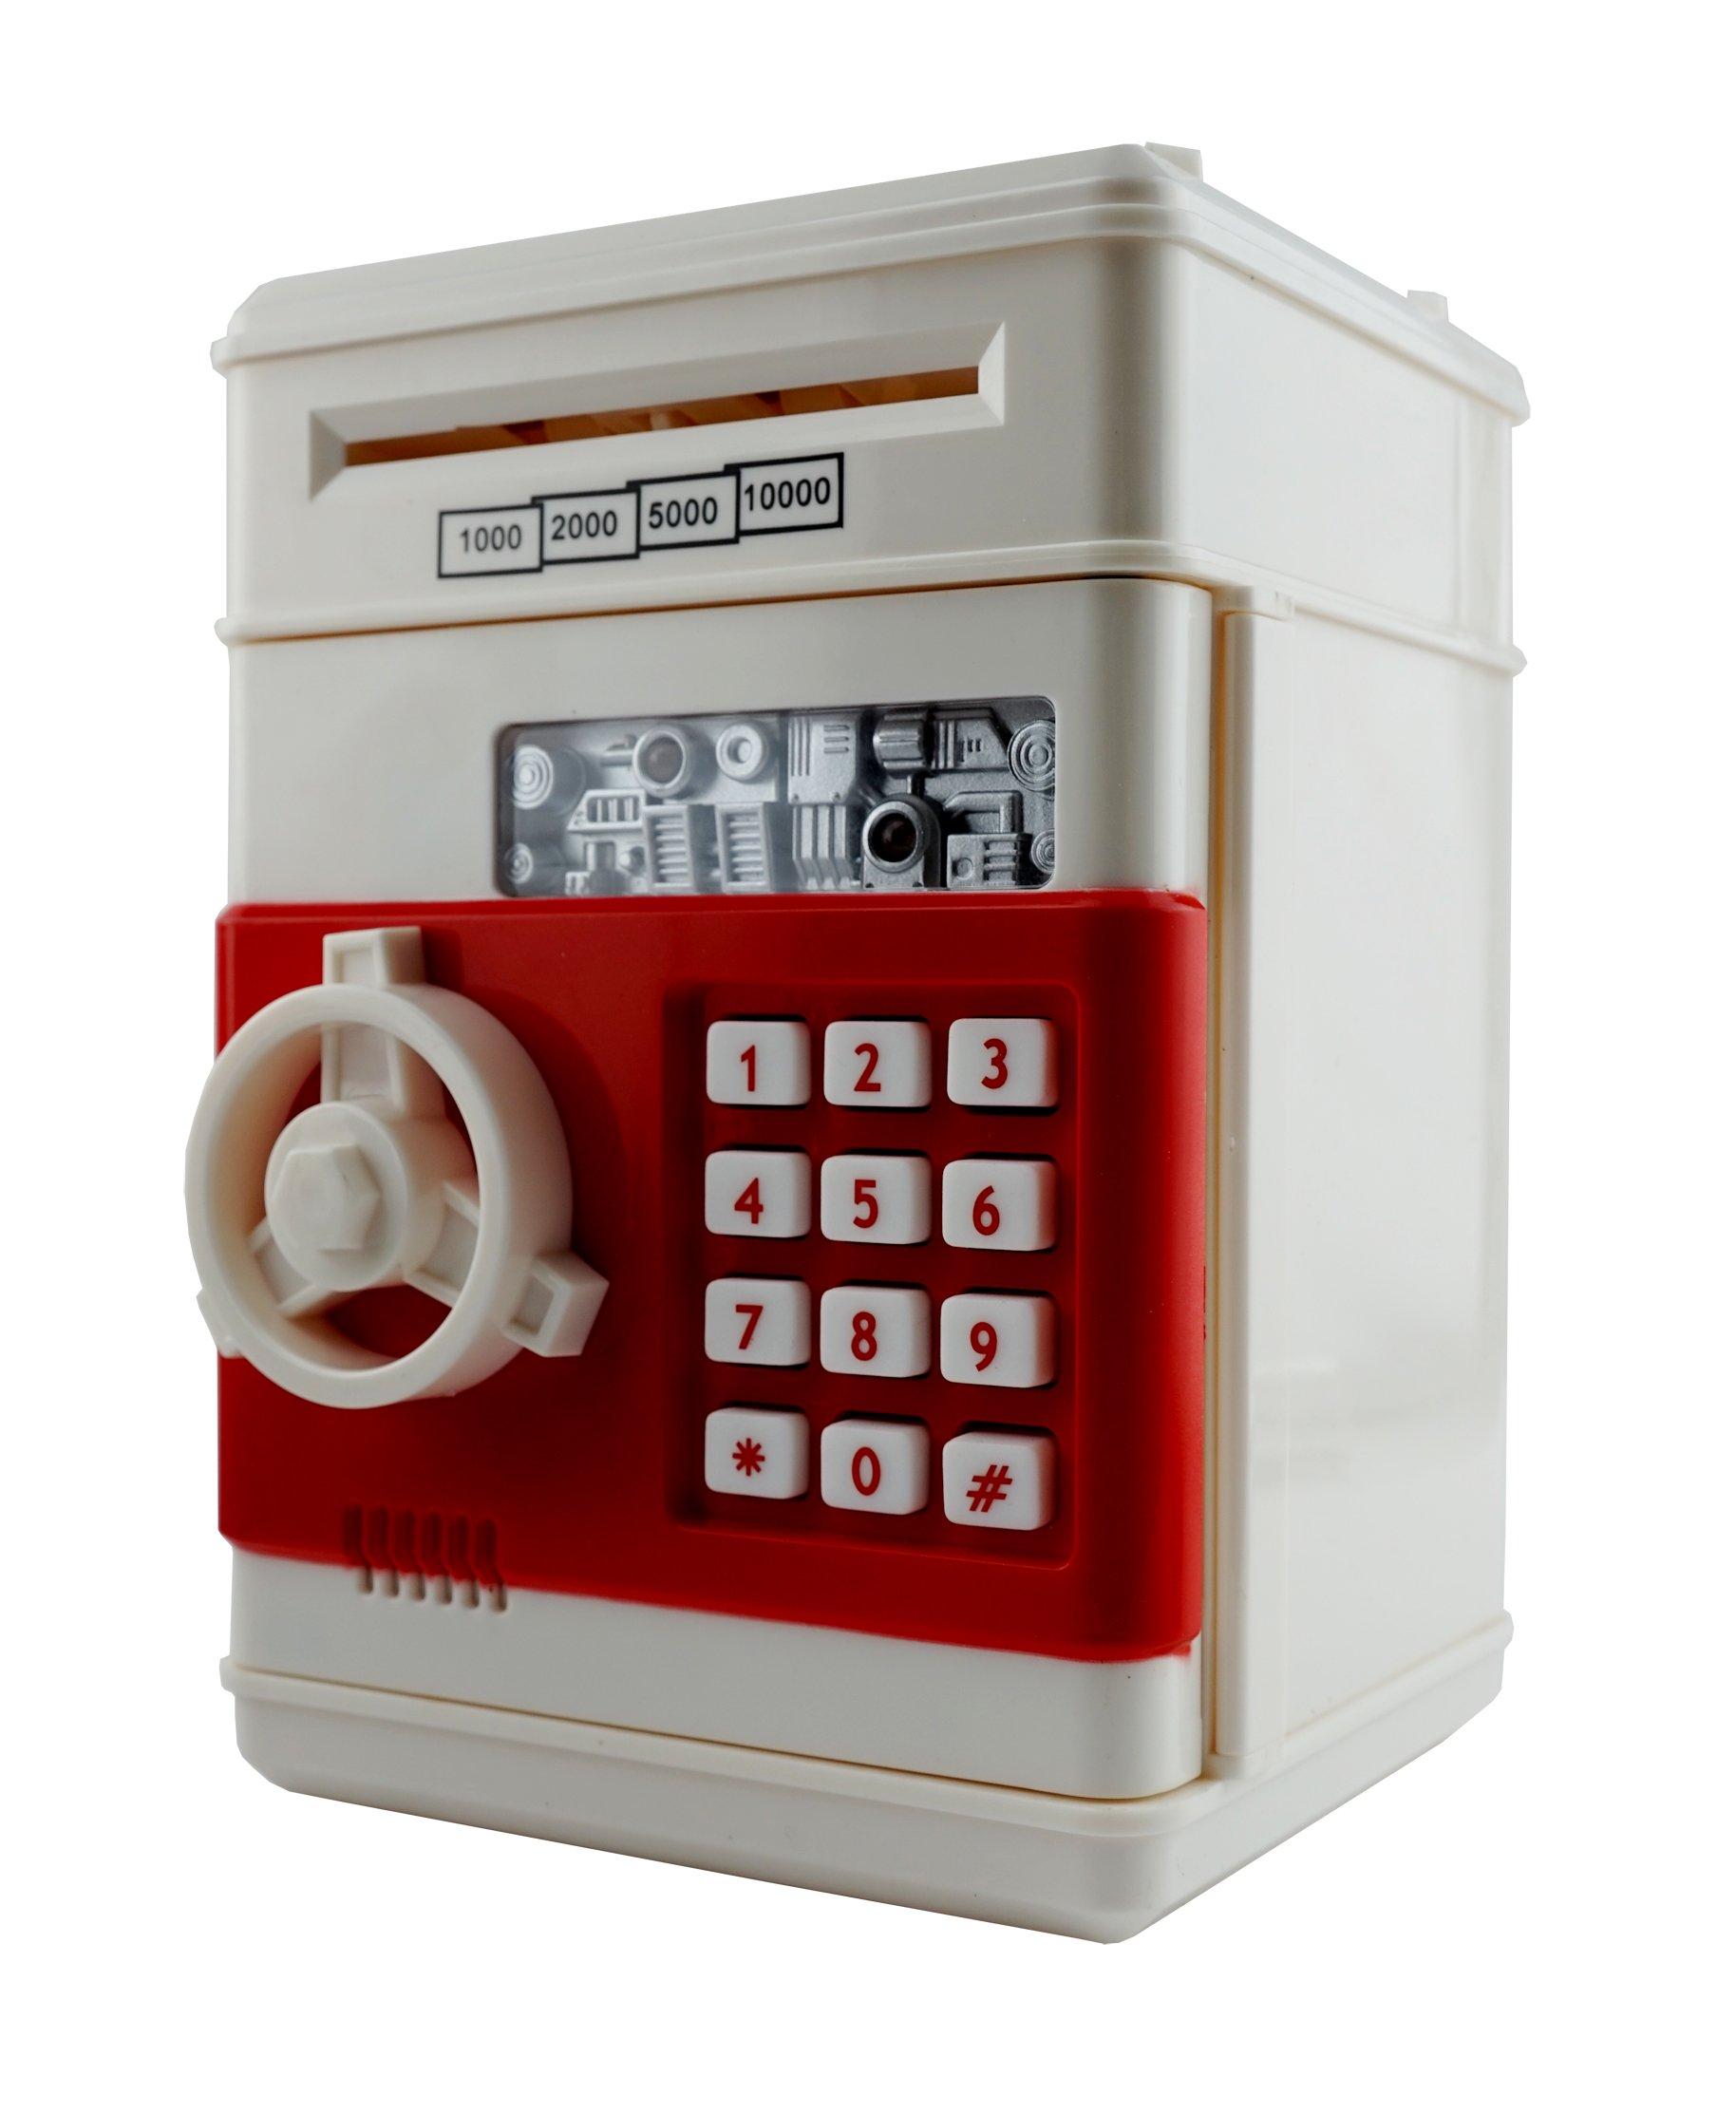 6goodeals Money Saving Piggy Bank Coin Storage for ATM Safety Box Bills Safe - USA SELLER! (Cream White)